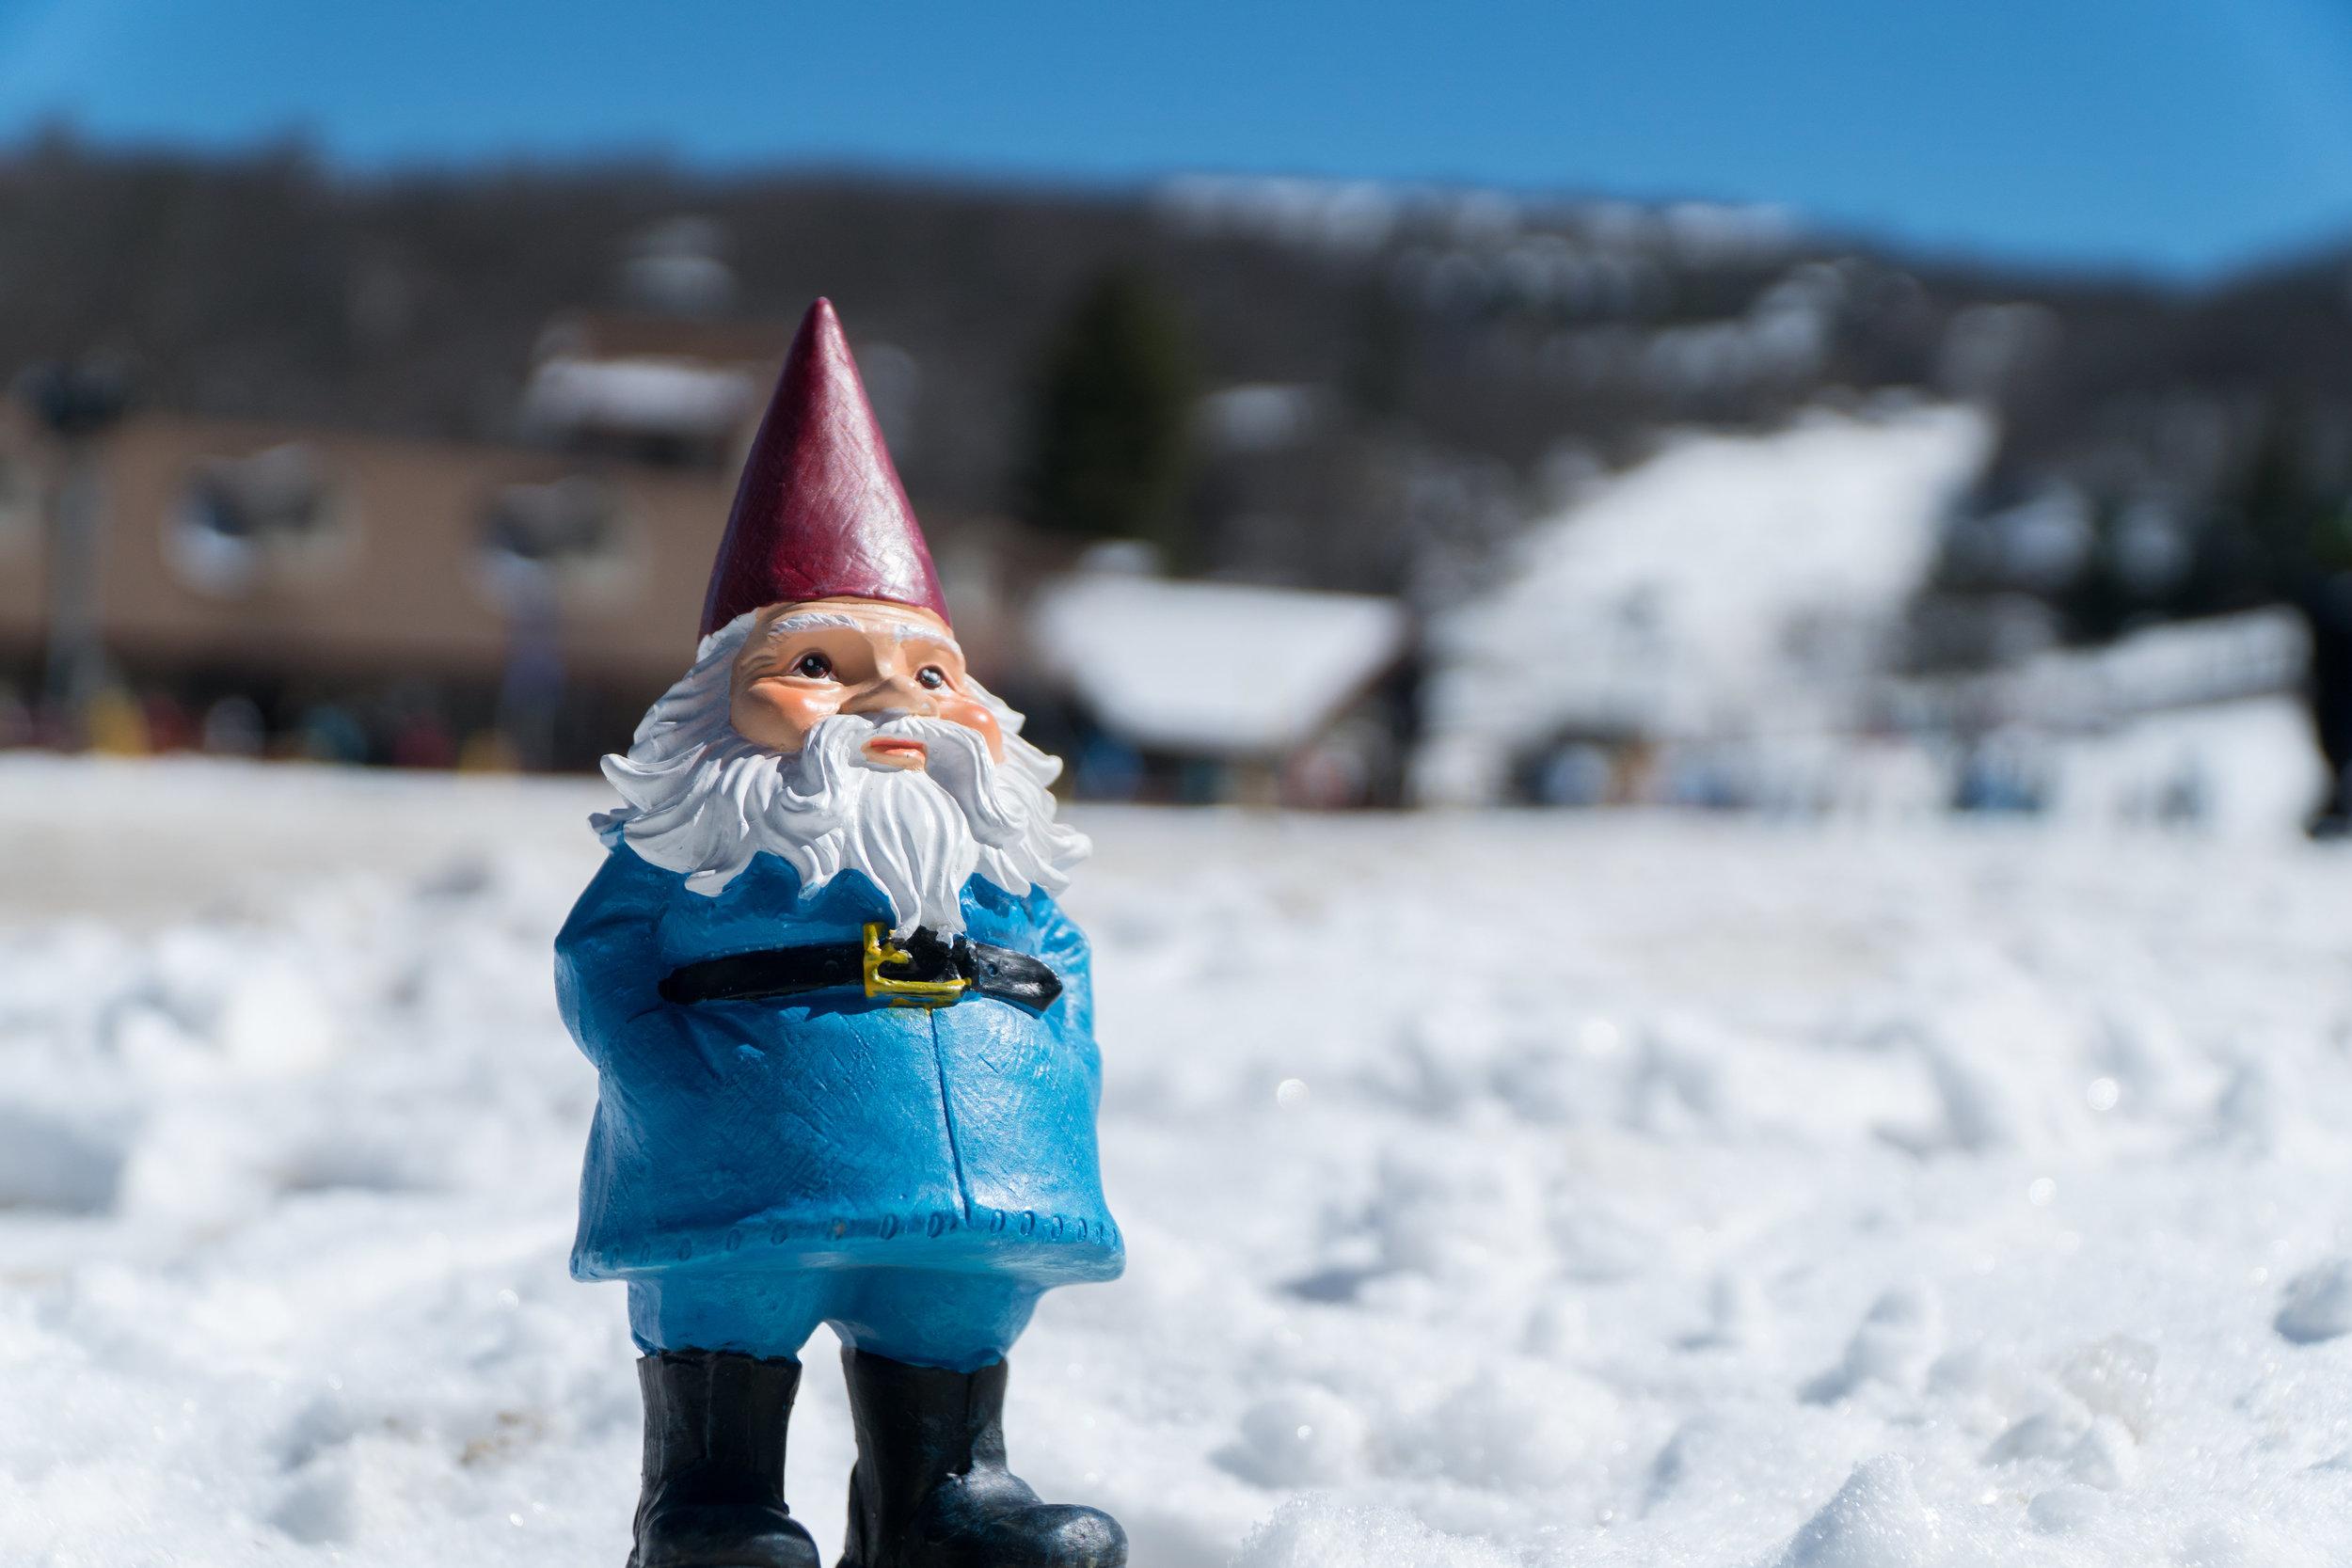 Travelocity's Roaming Gnome Visits Beech Mountain